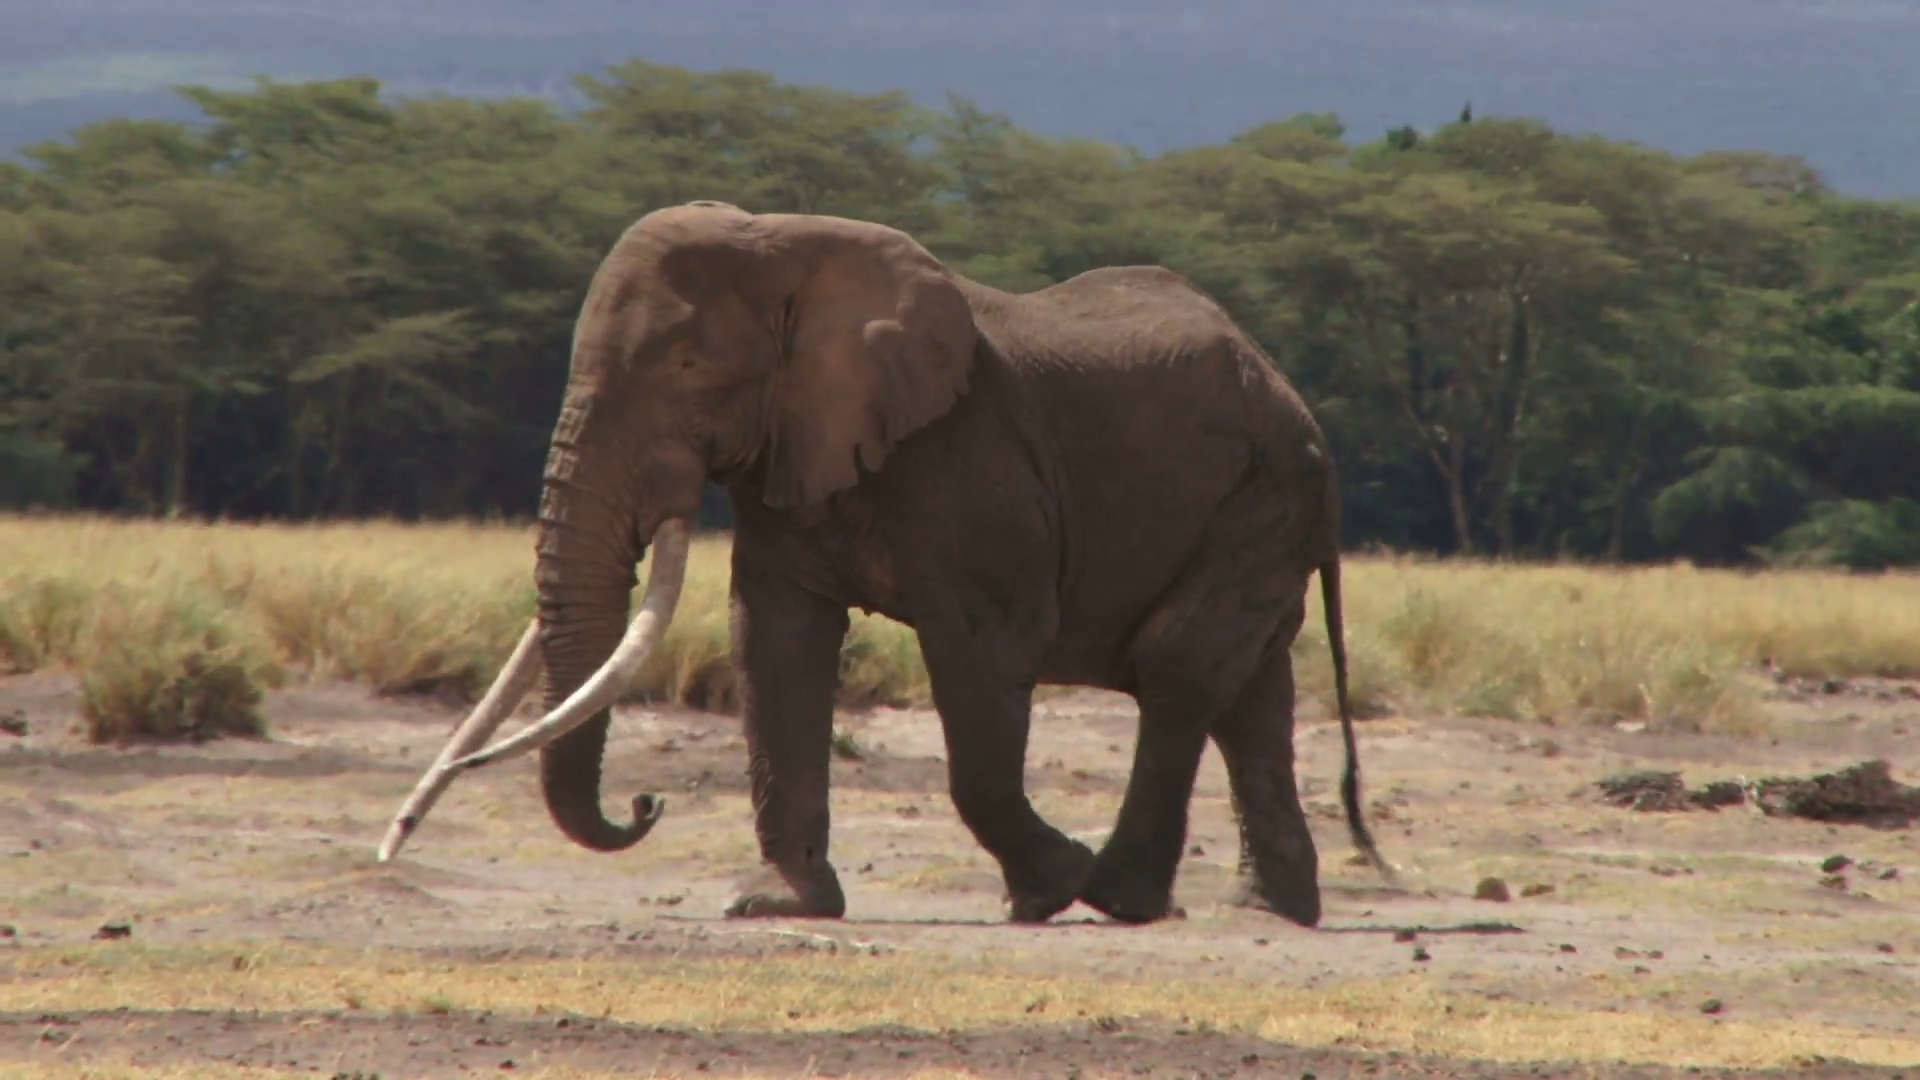 A bull elephant walking slowly. Stock Video Footage - Videoblocks